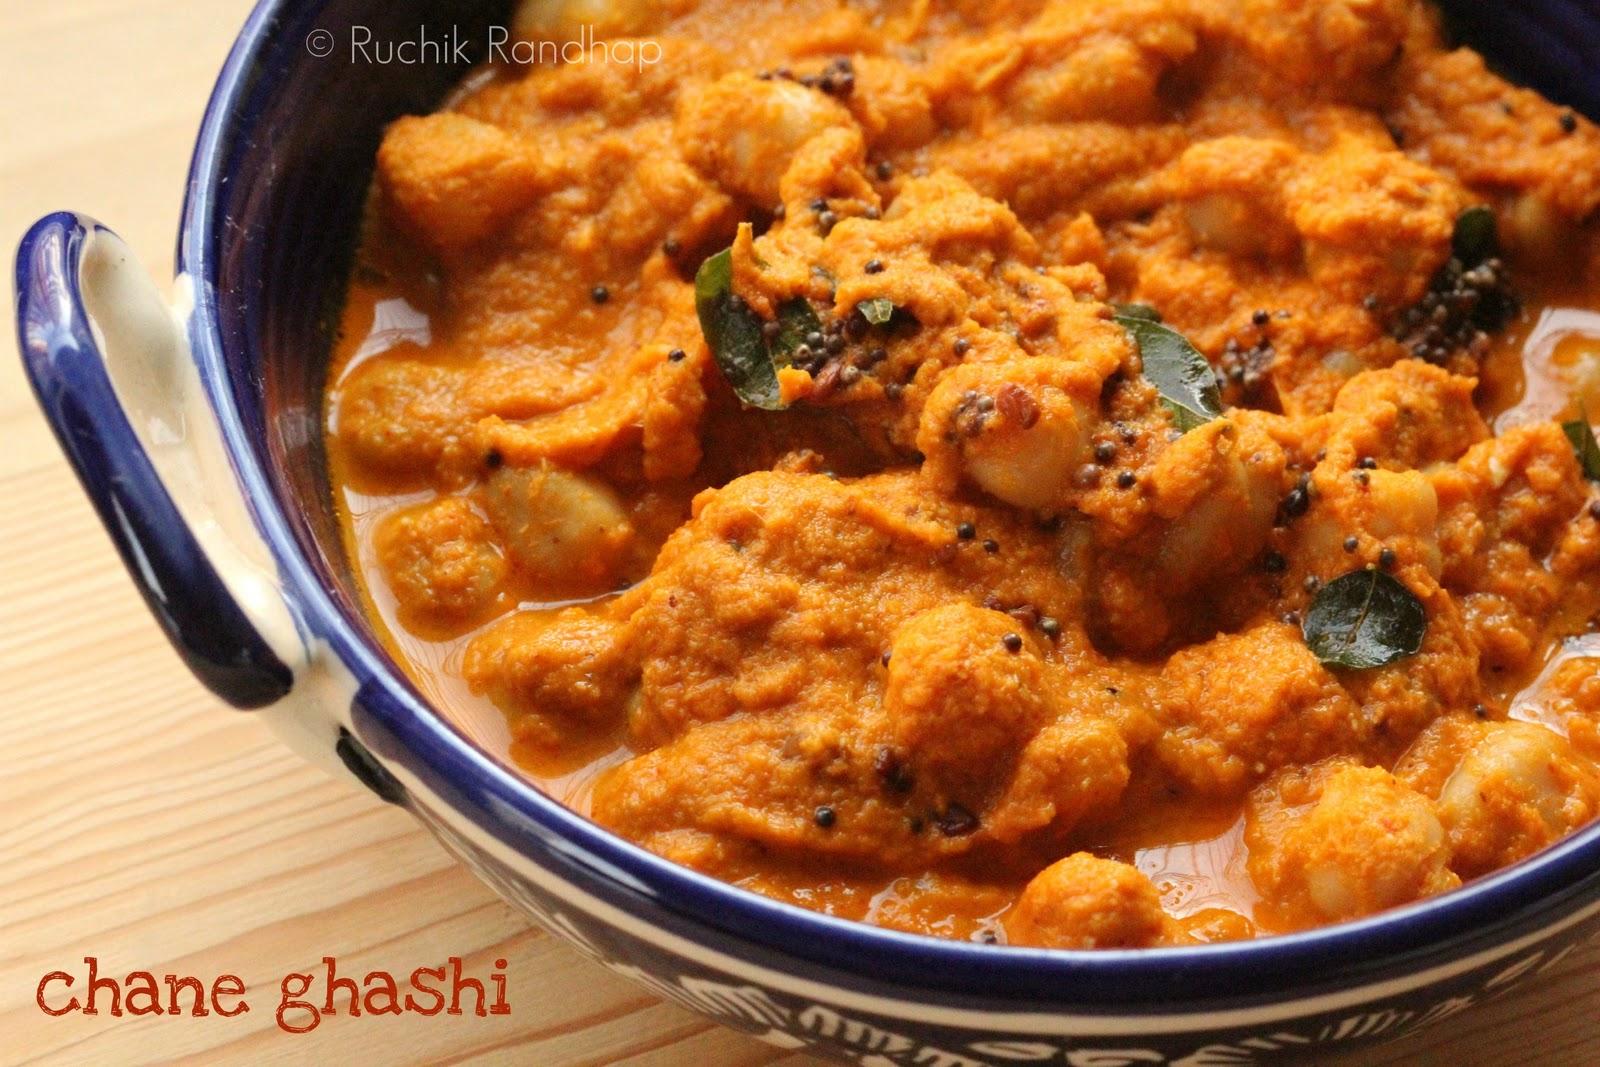 Chane Ghashi (Konkani Style Chickpeas Curry) - Ruchik Randhap